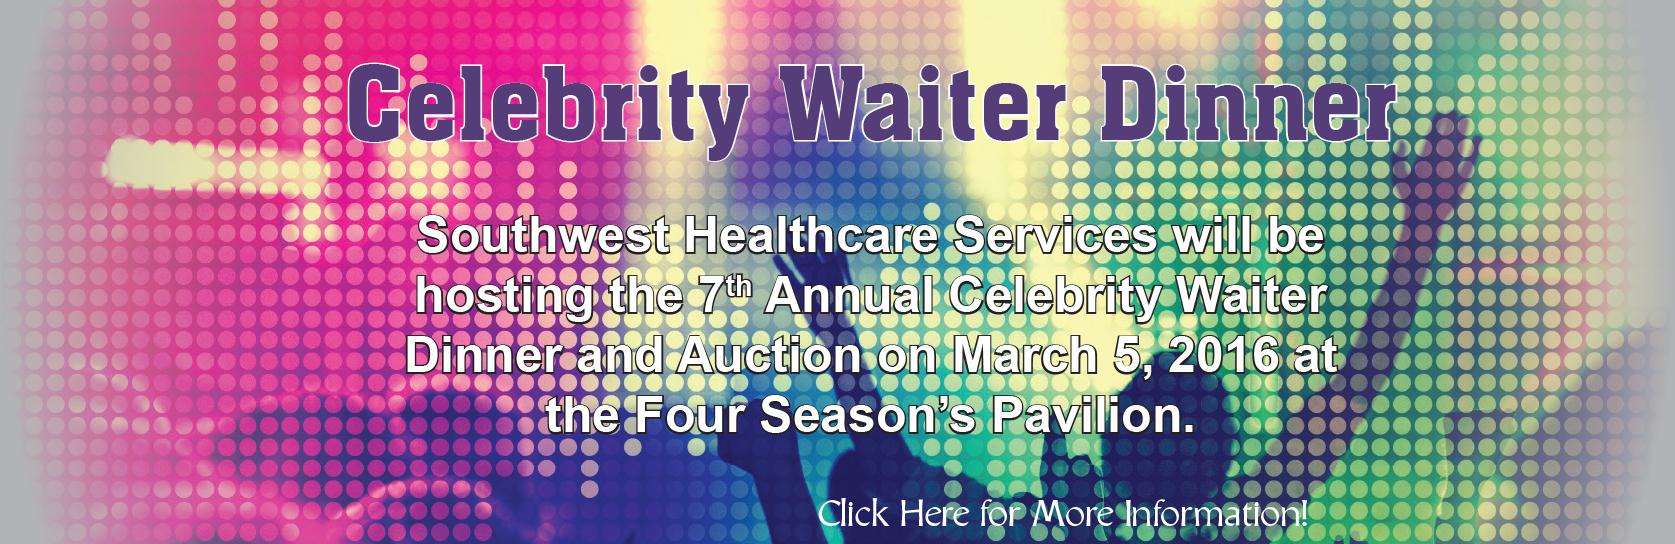 Celebrity Waiter